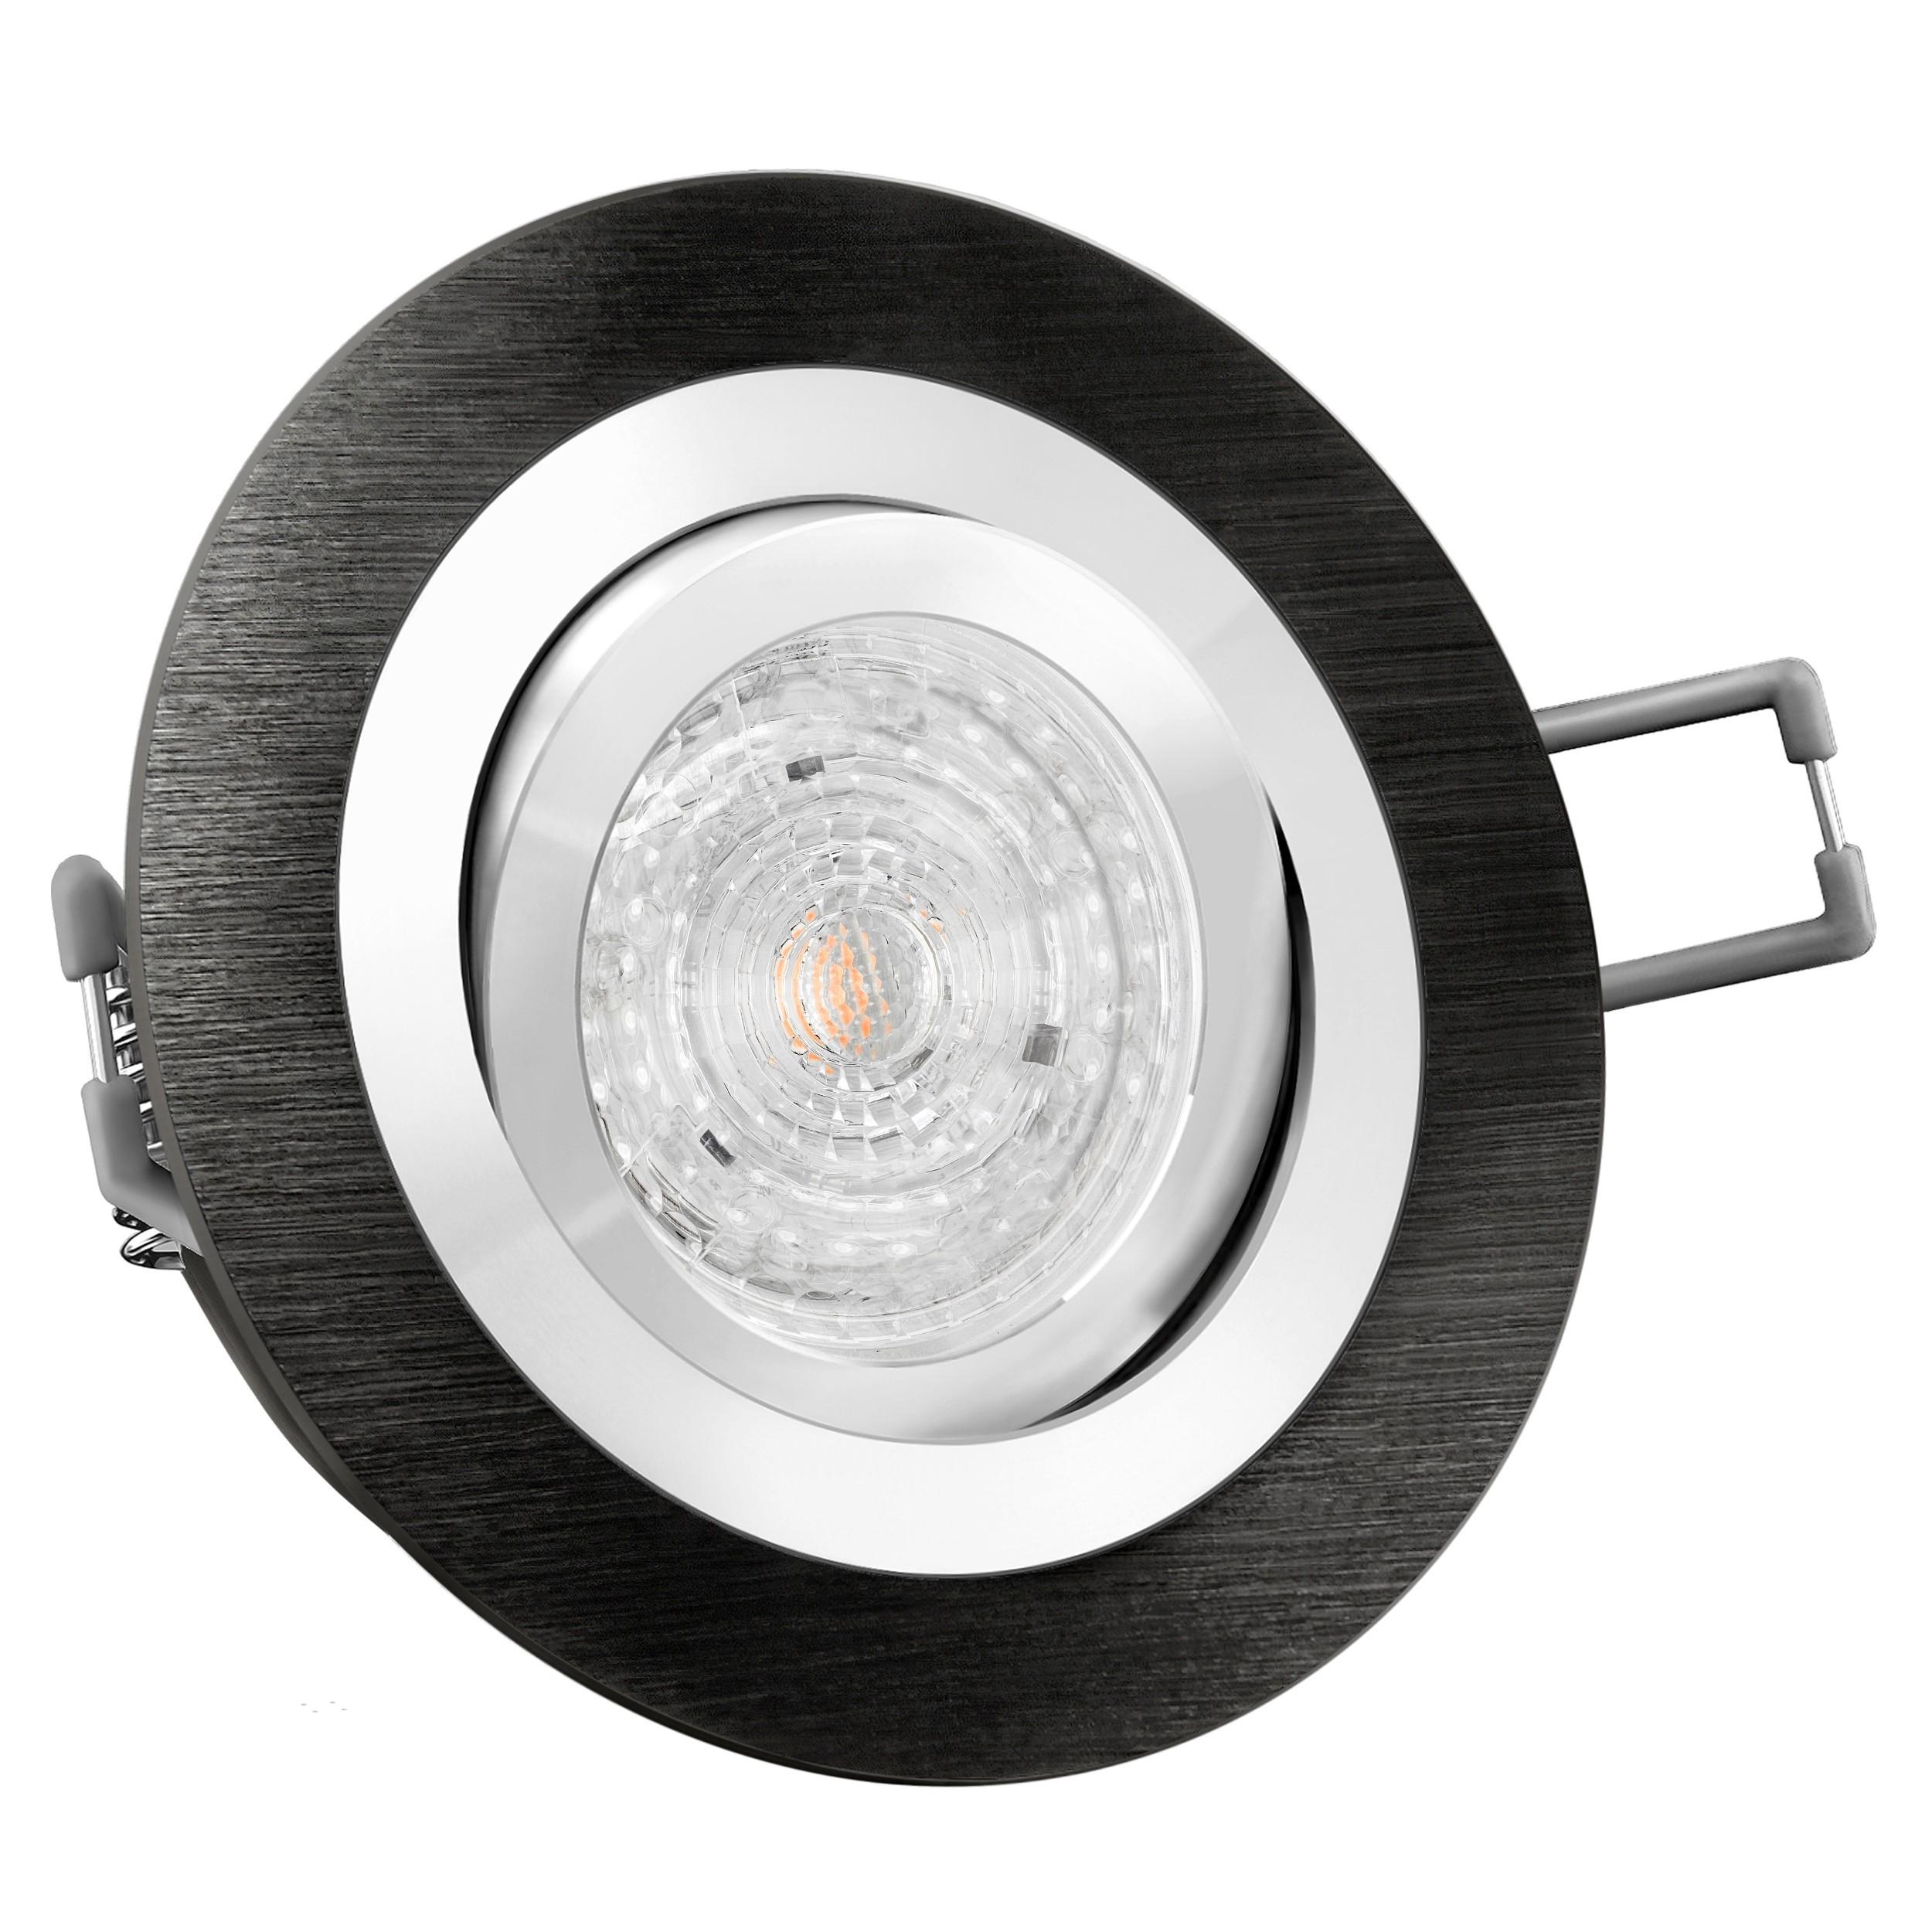 RF-2 LED-Einbaustrahler Alu rund schwarz OSRAM 4,6W DIMMBAR warm weiß 230V